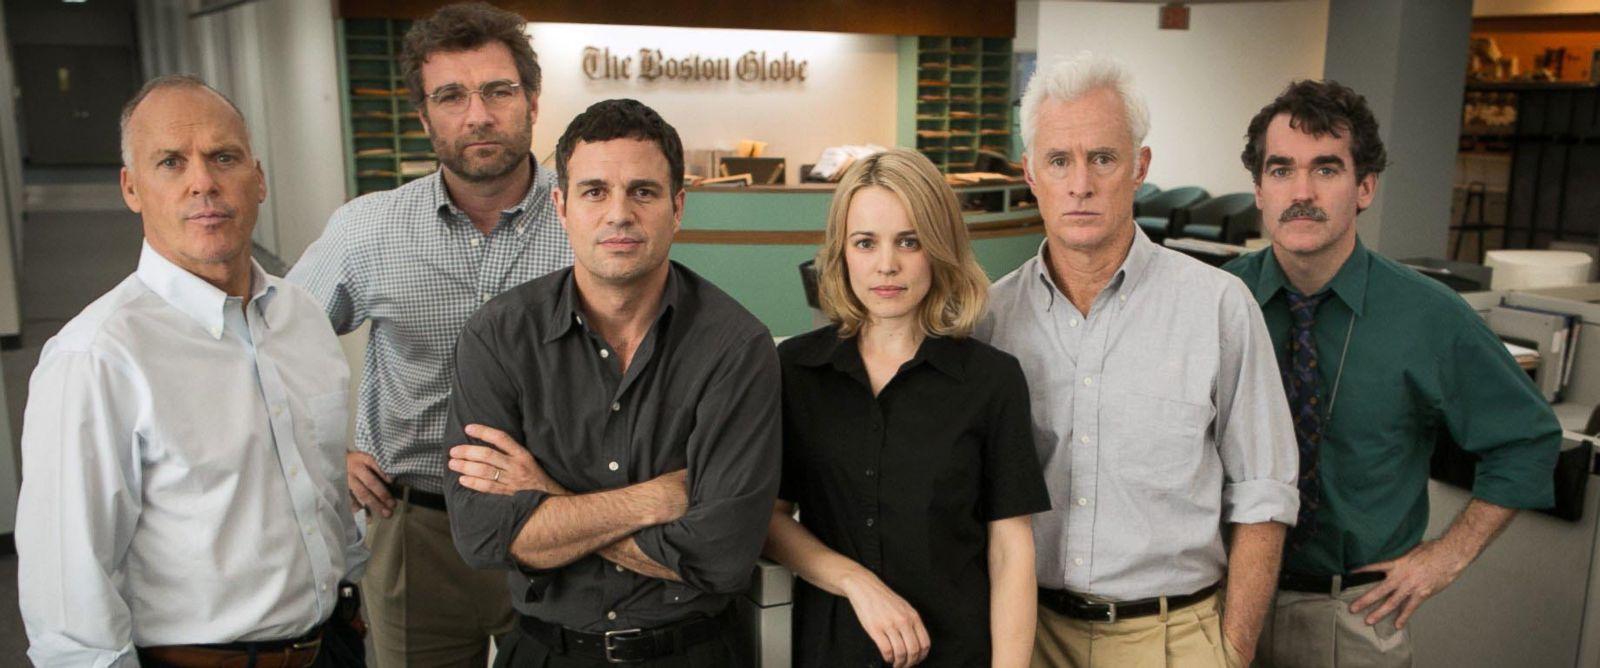 "PHOTO: The cast of the movie ""Spotlight,"" from left, Michael Keaton, Liev Schreiber, Mark Ruffalo, Rachel McAdams, John Slattery and Brian dArcy James."